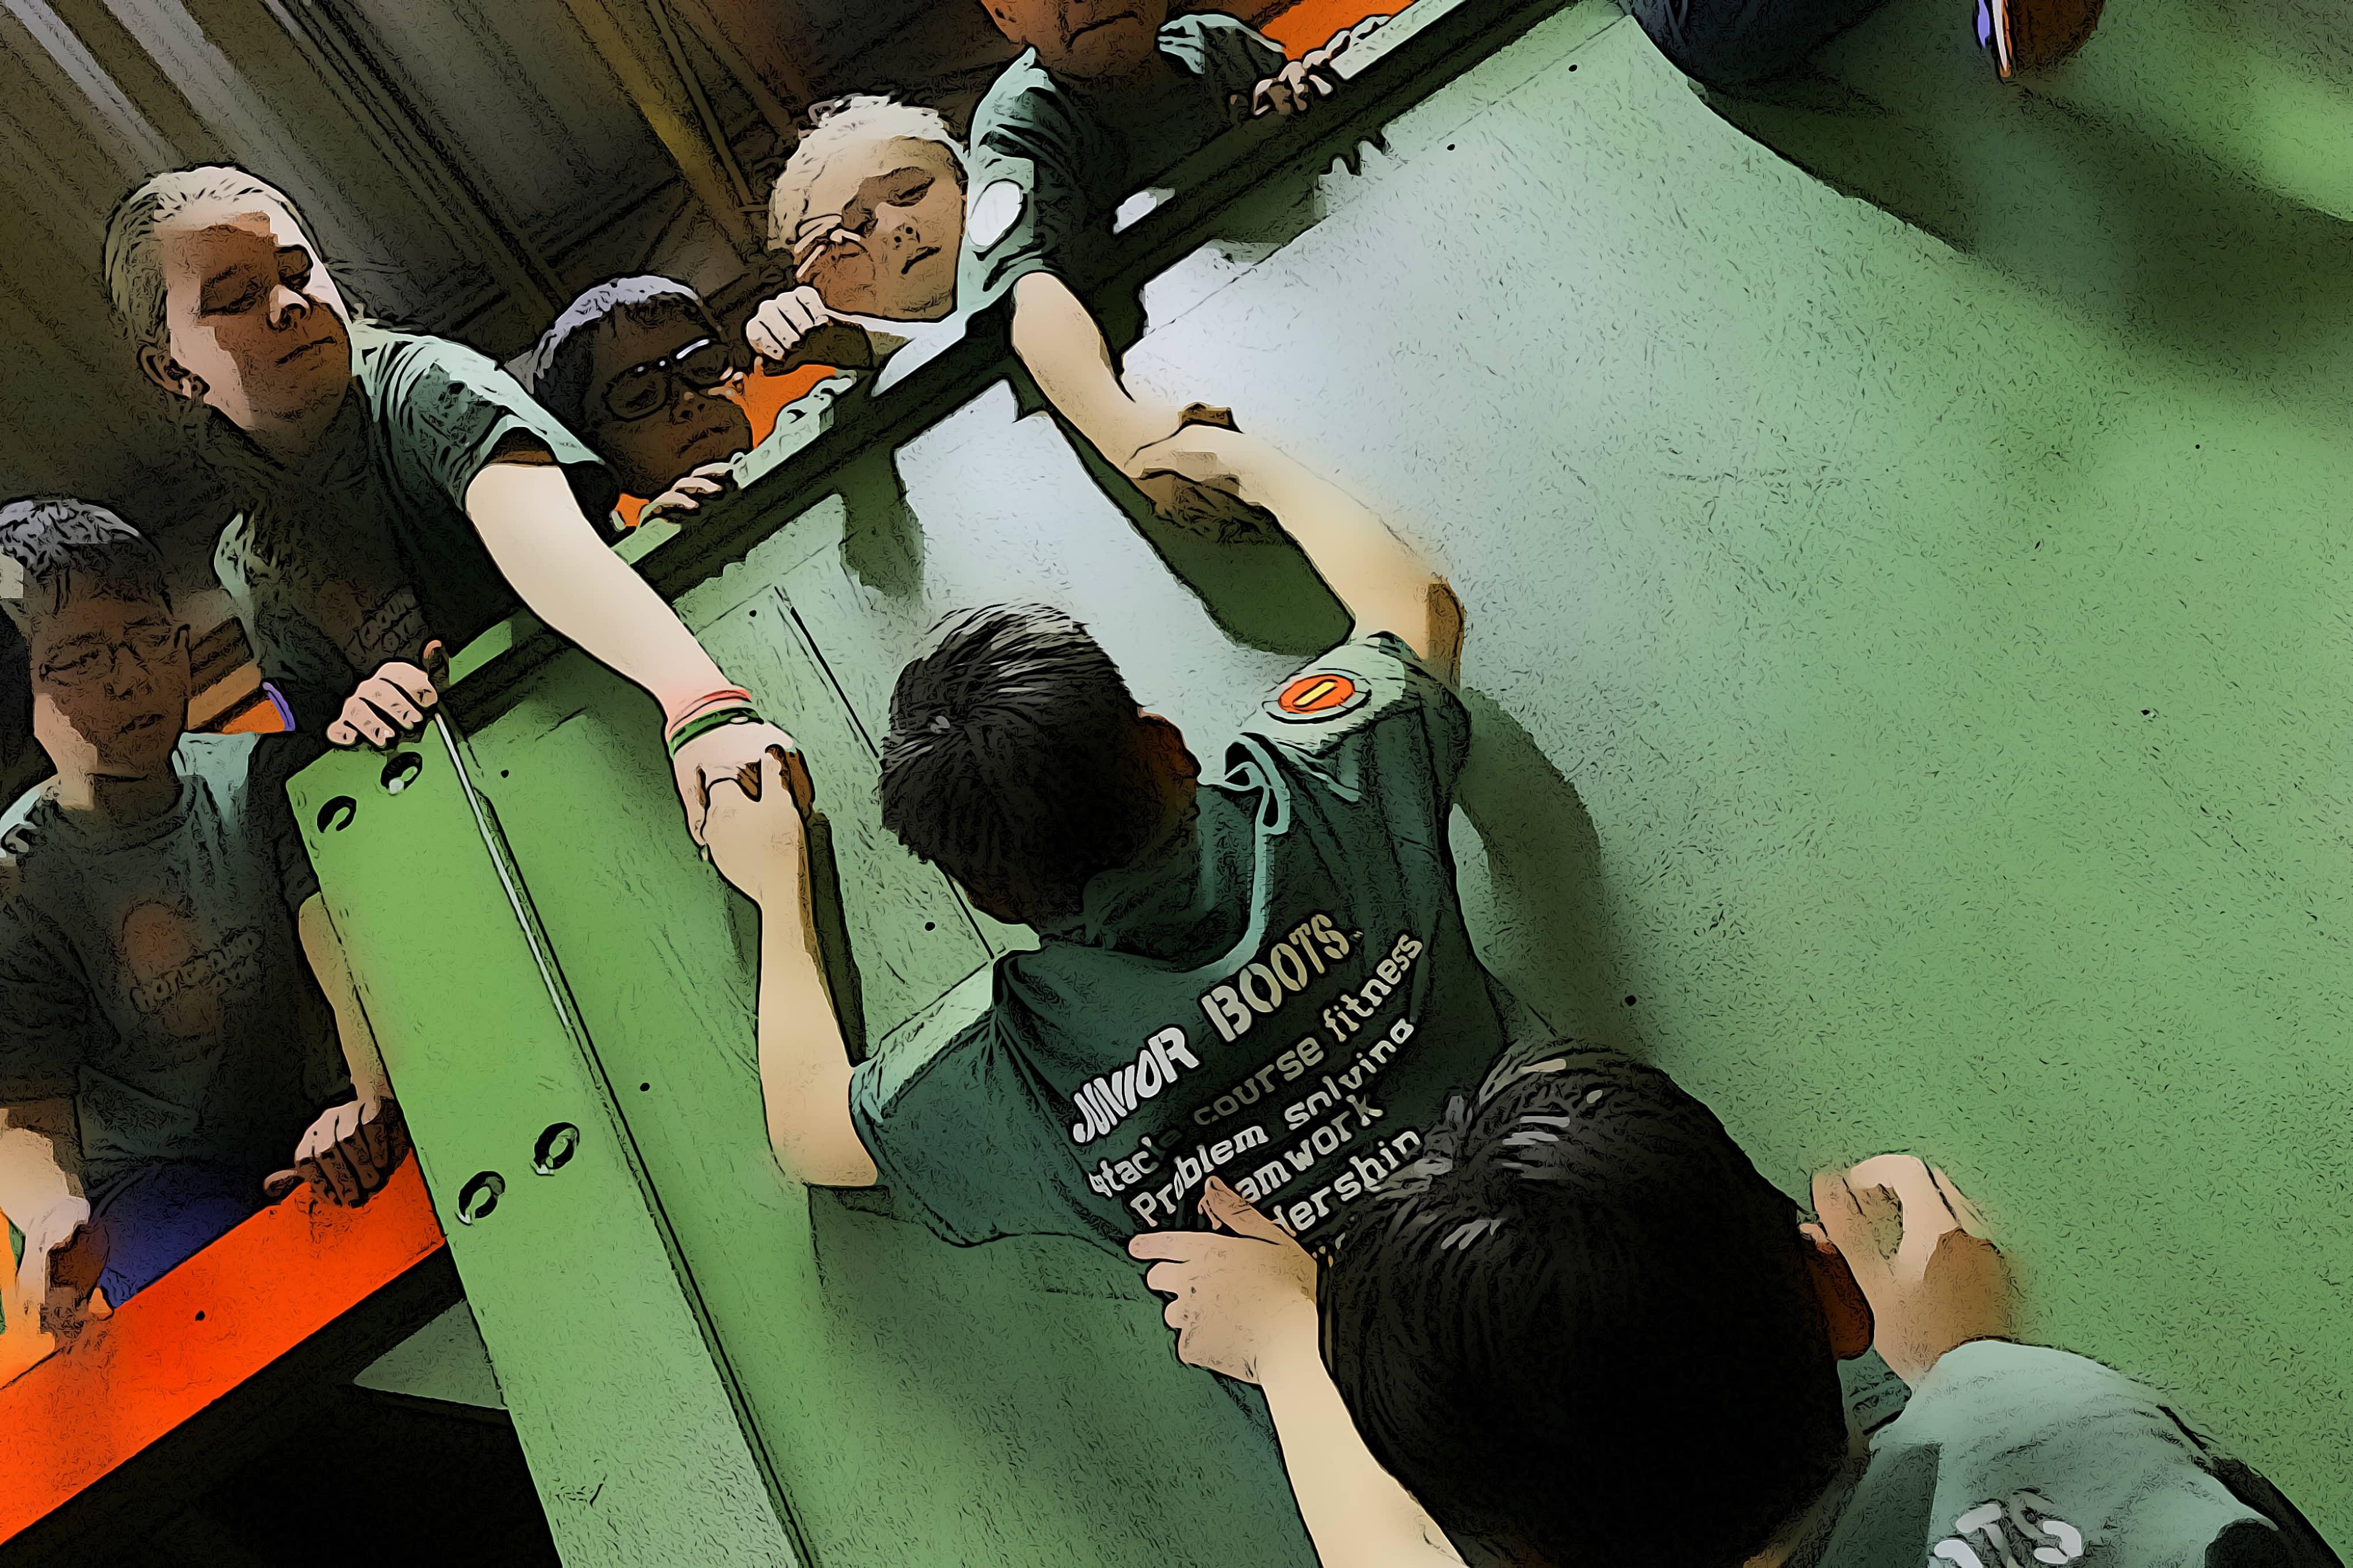 Junior boots - children help each other in training